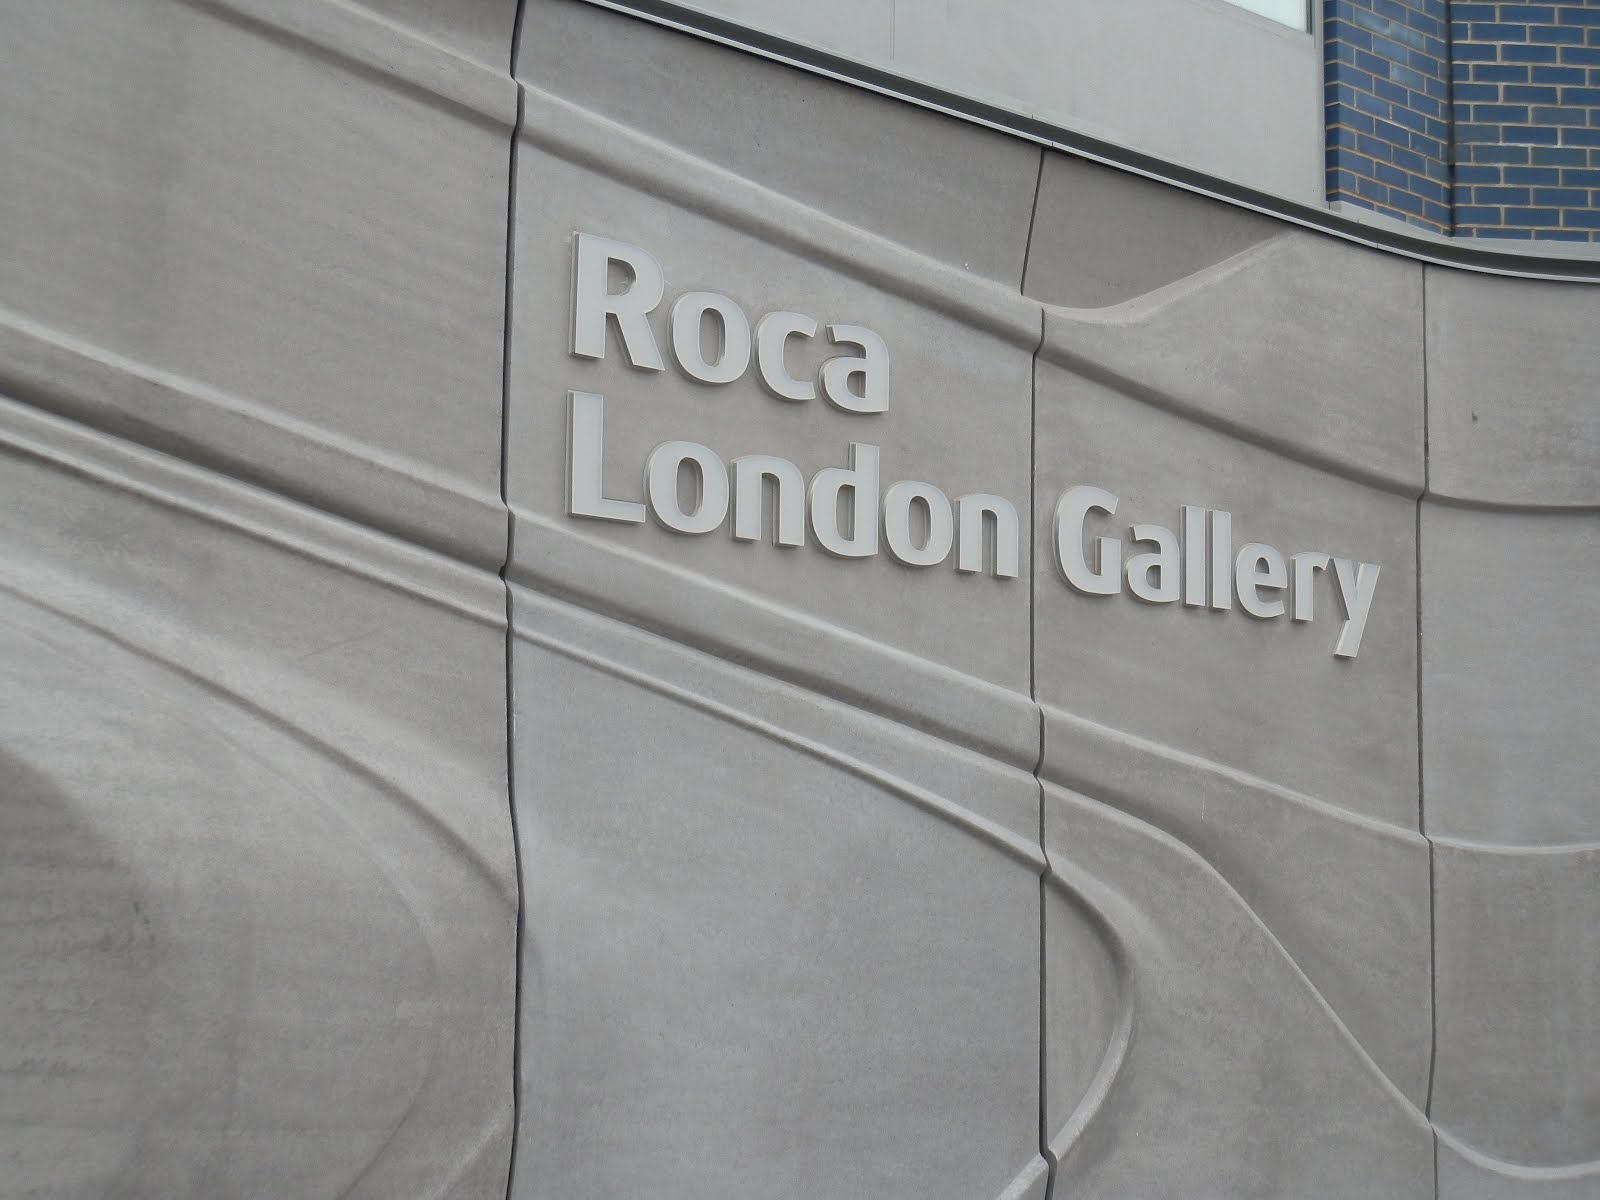 Livin Sponge Roca London Gallery By Zaha Hadid